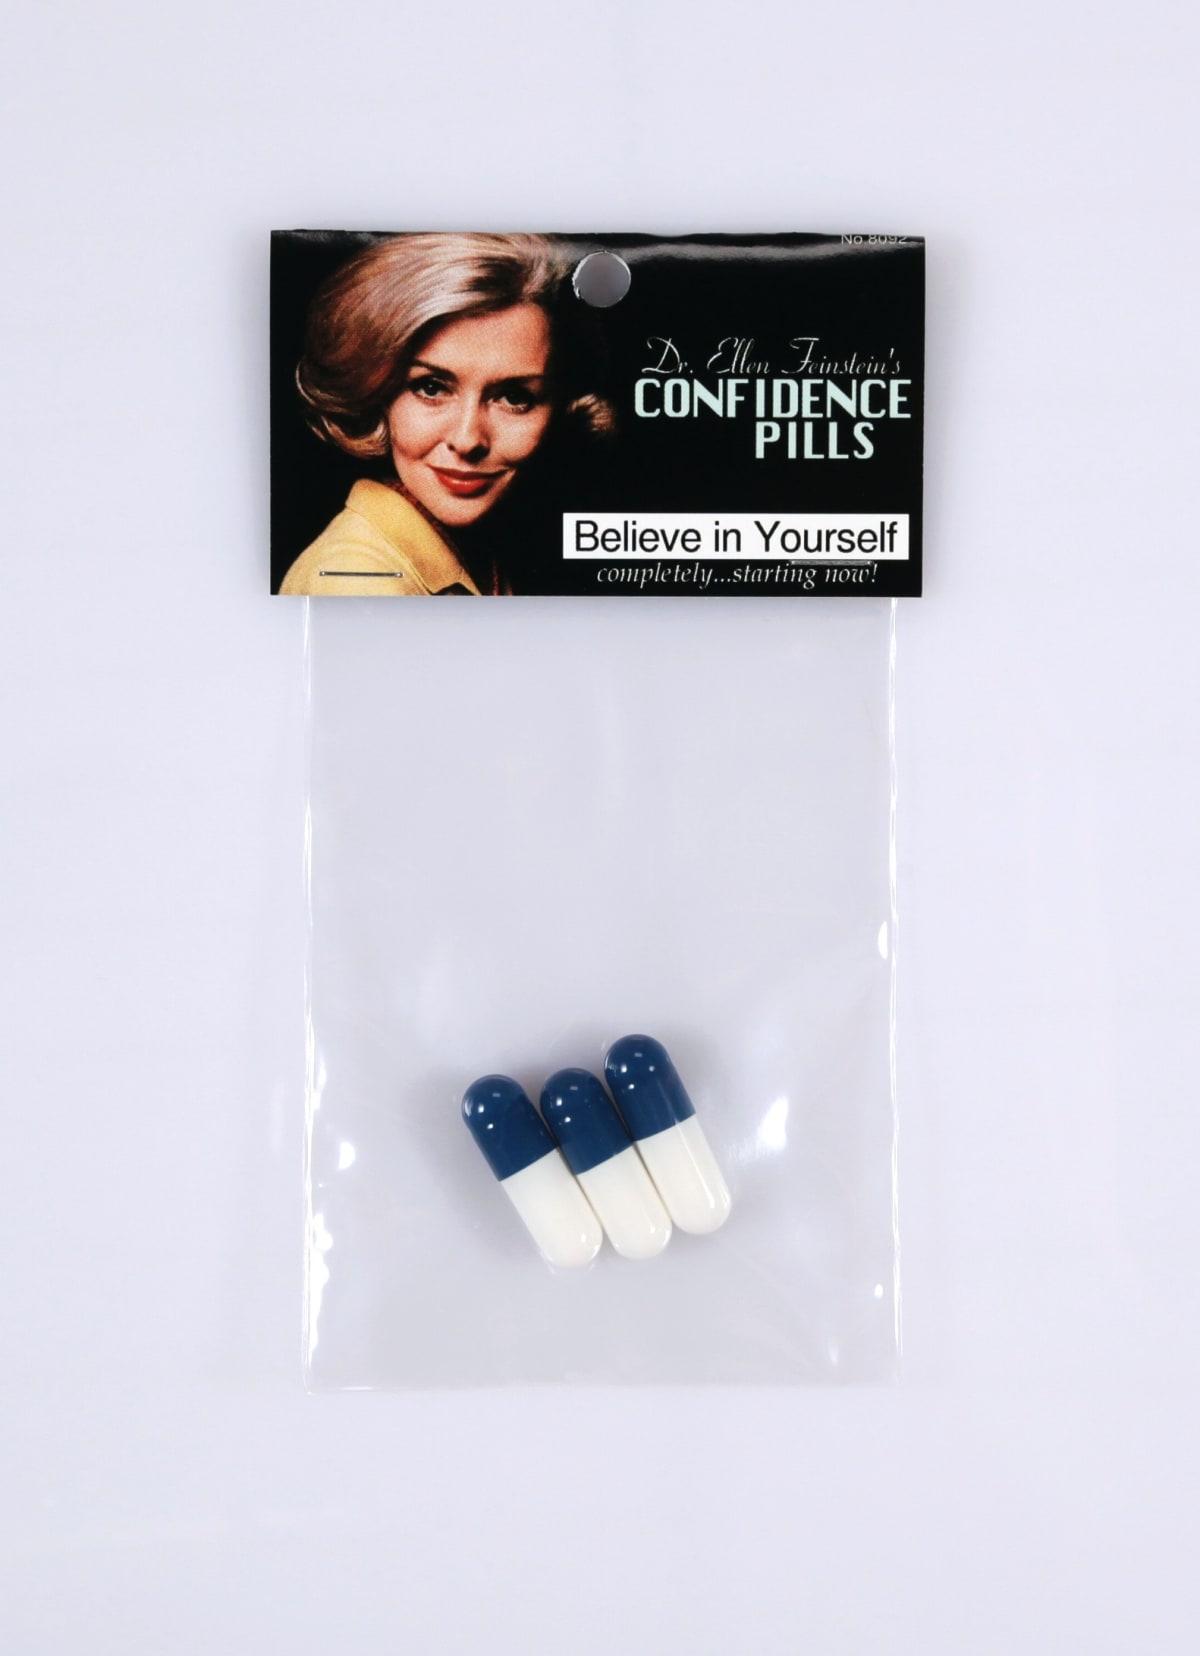 Confidence pills, 2000